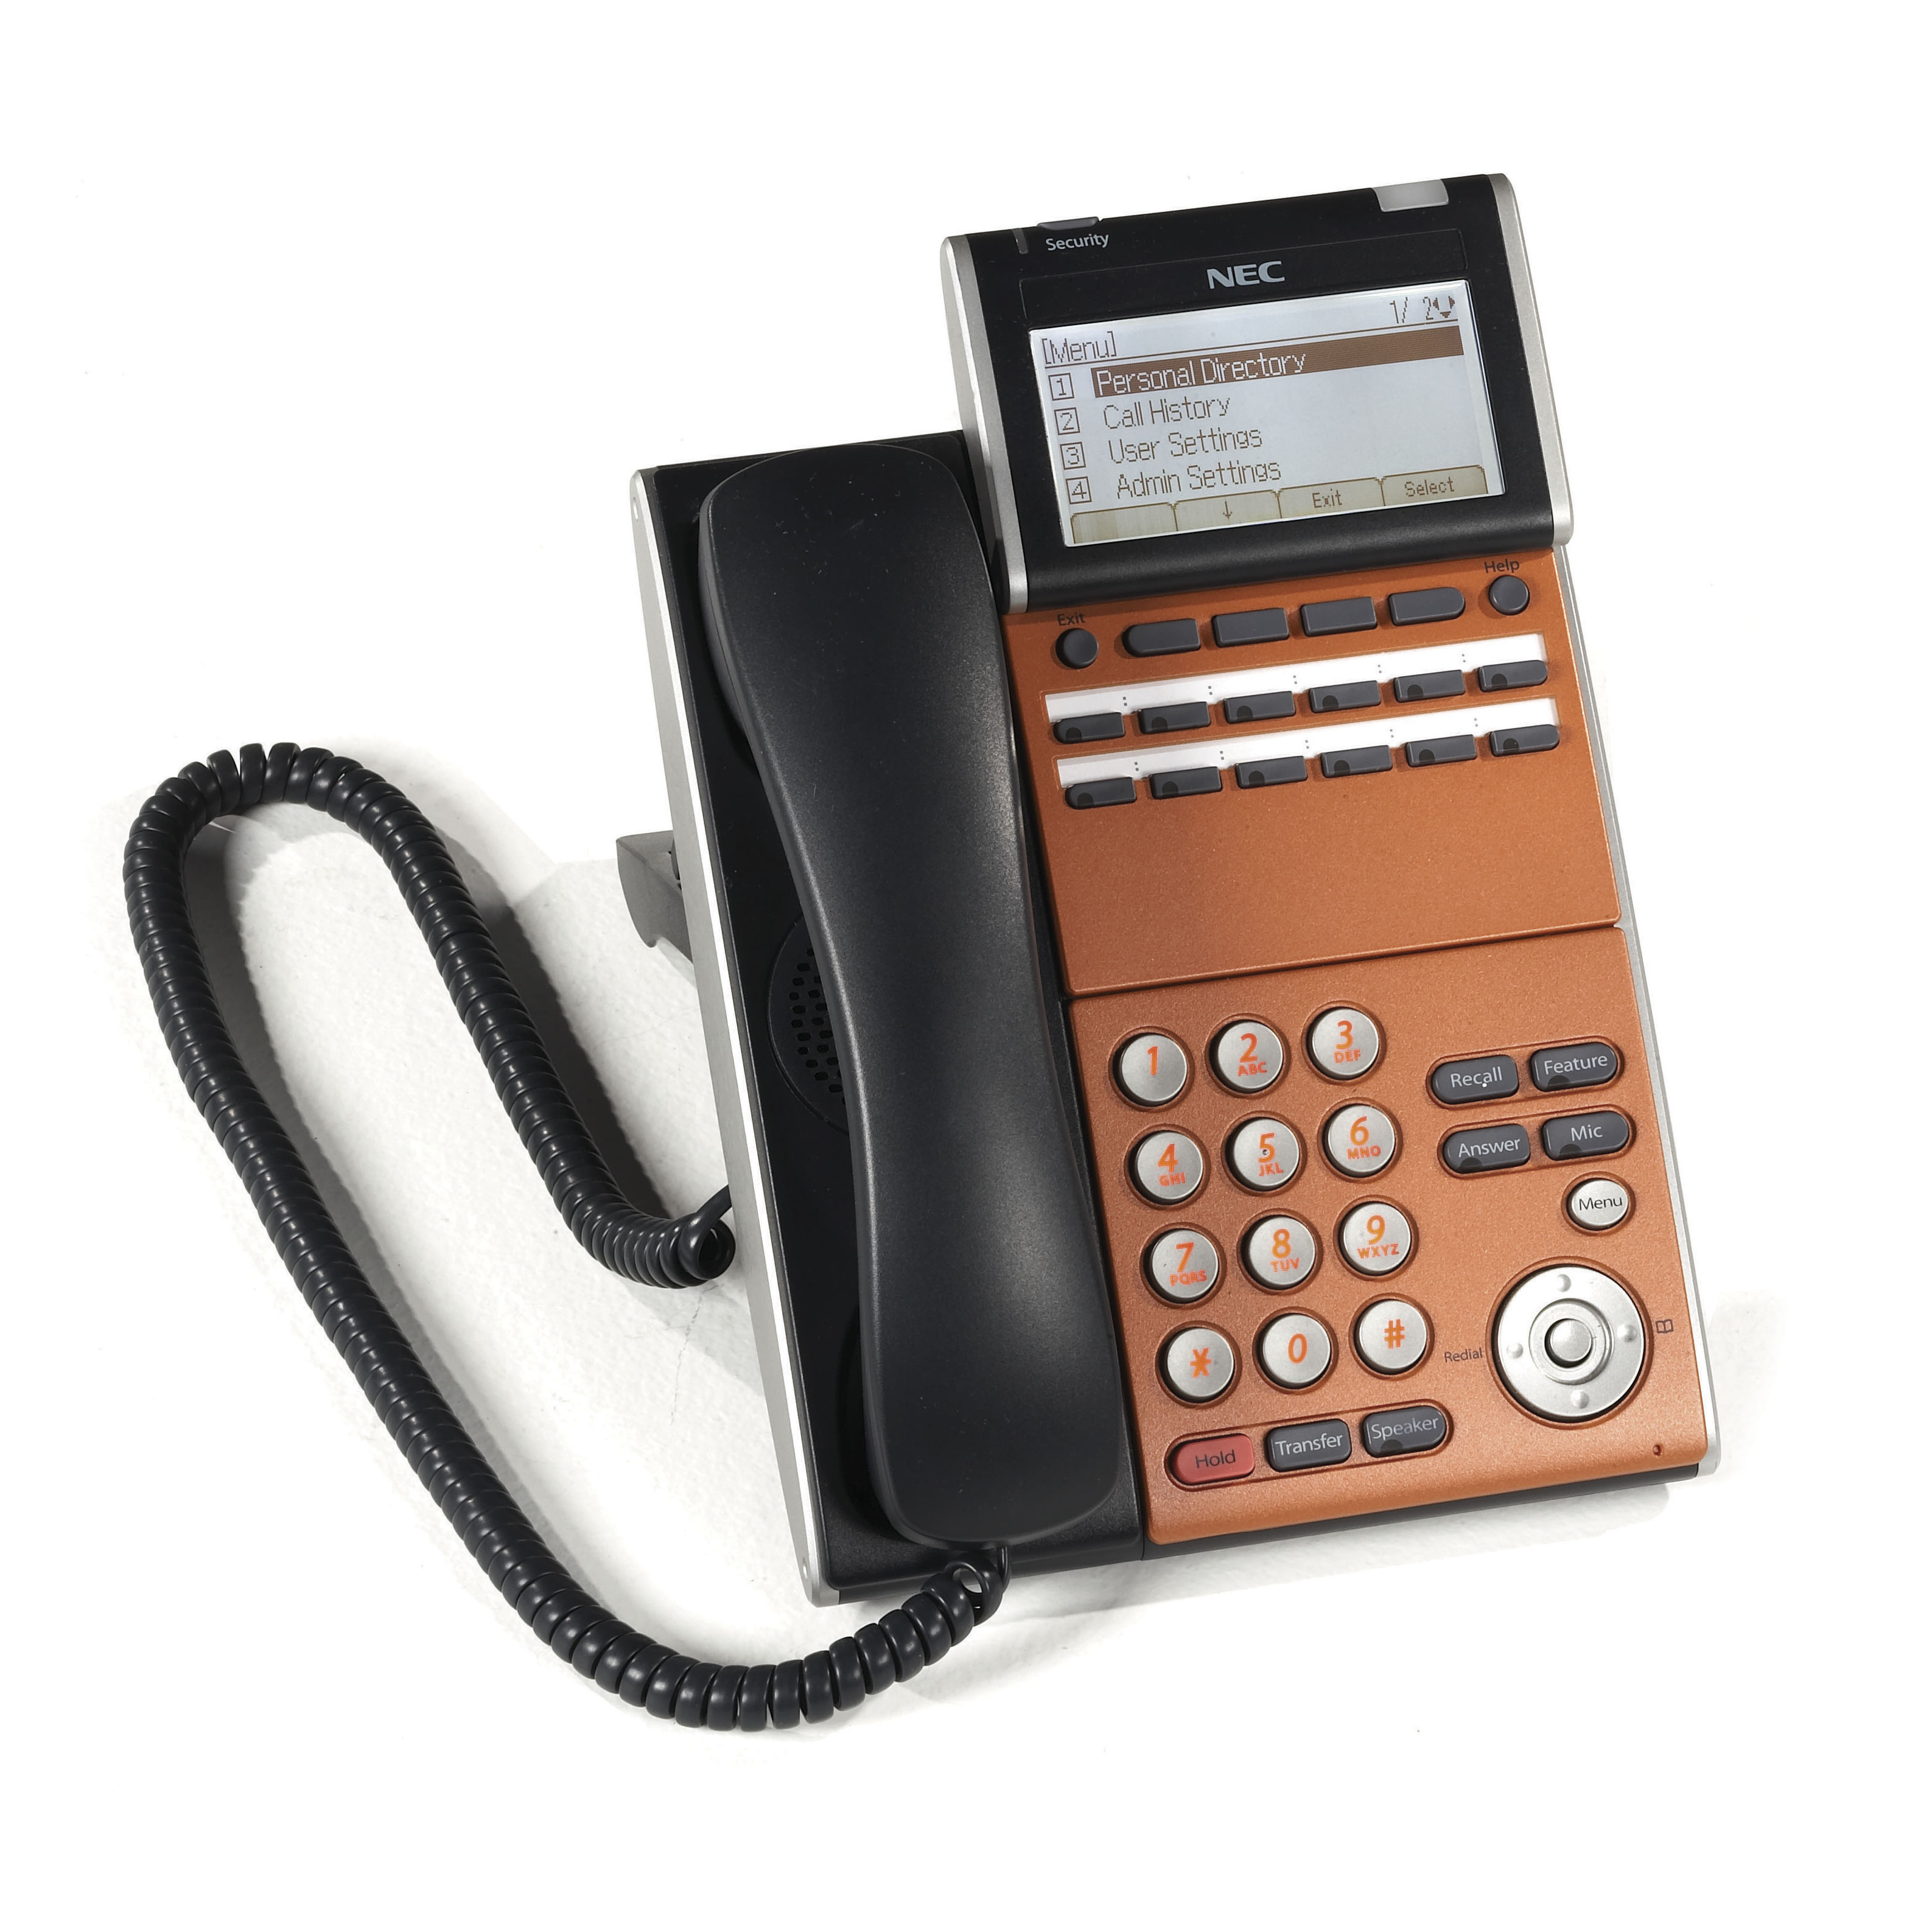 NEC DT700 Series Phone, Black, 690002